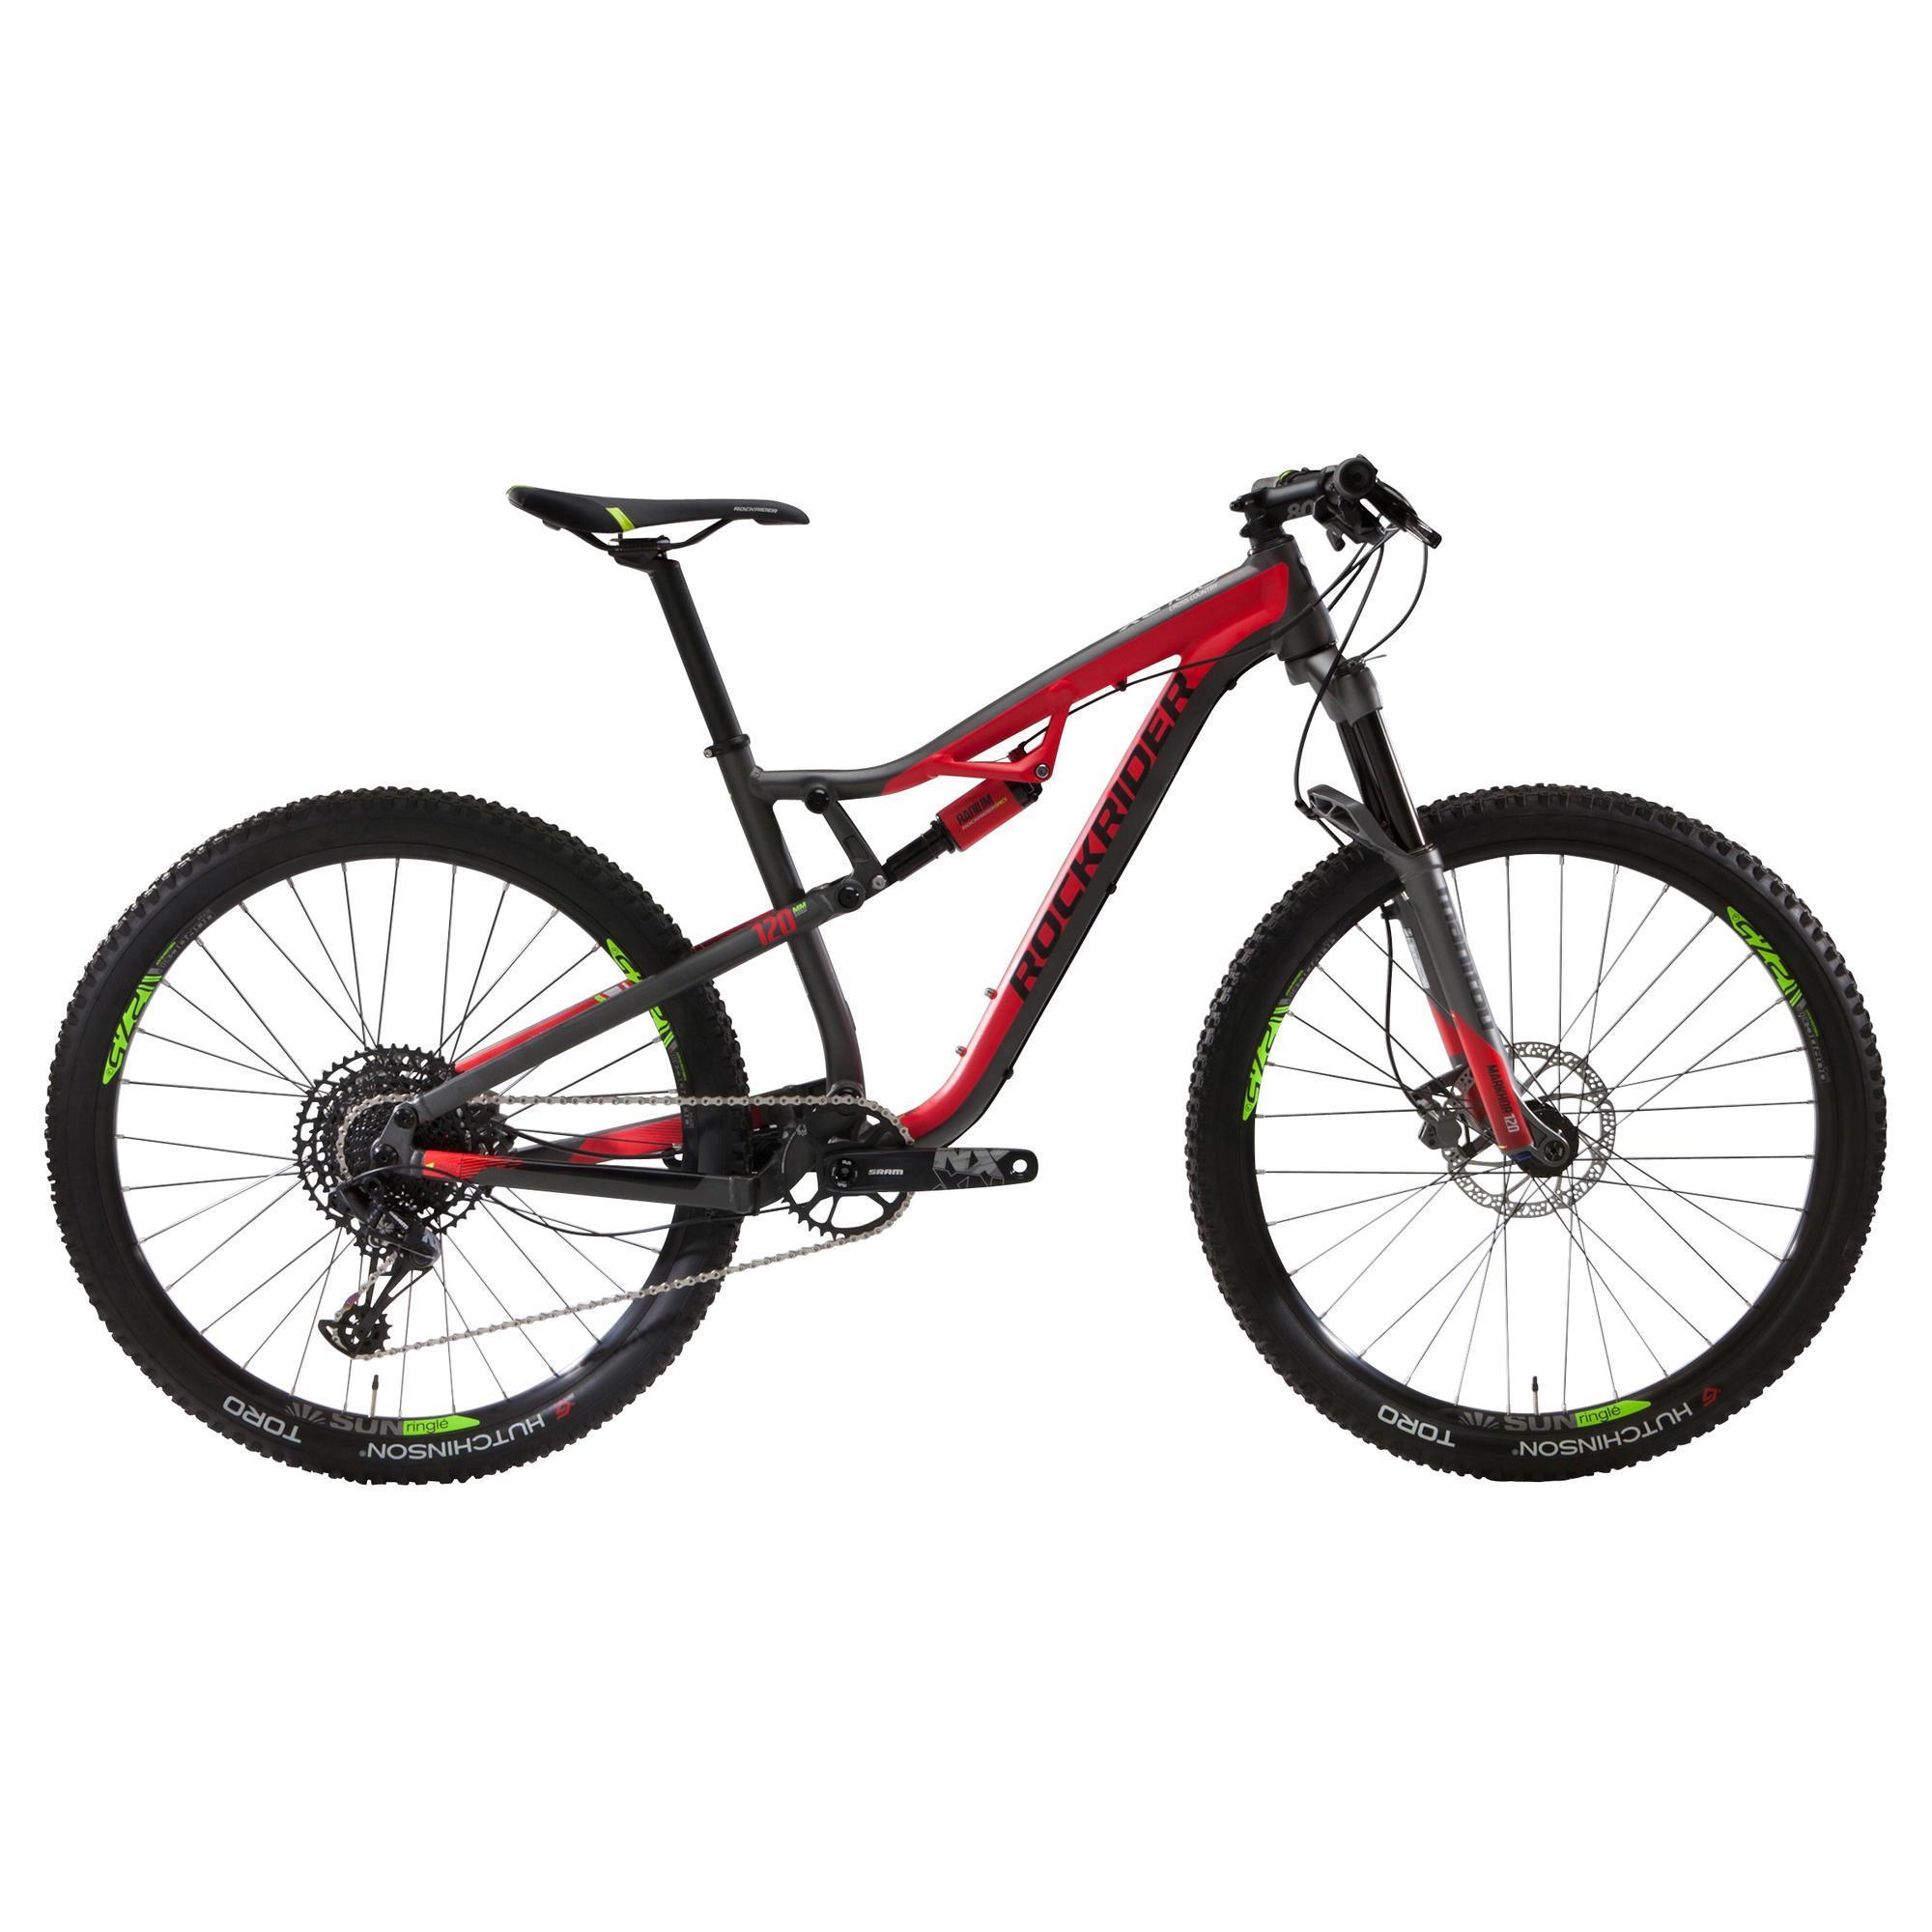 Rockrider MTB XC 100 27.5″ mountainbike 12 speed zwart/rood